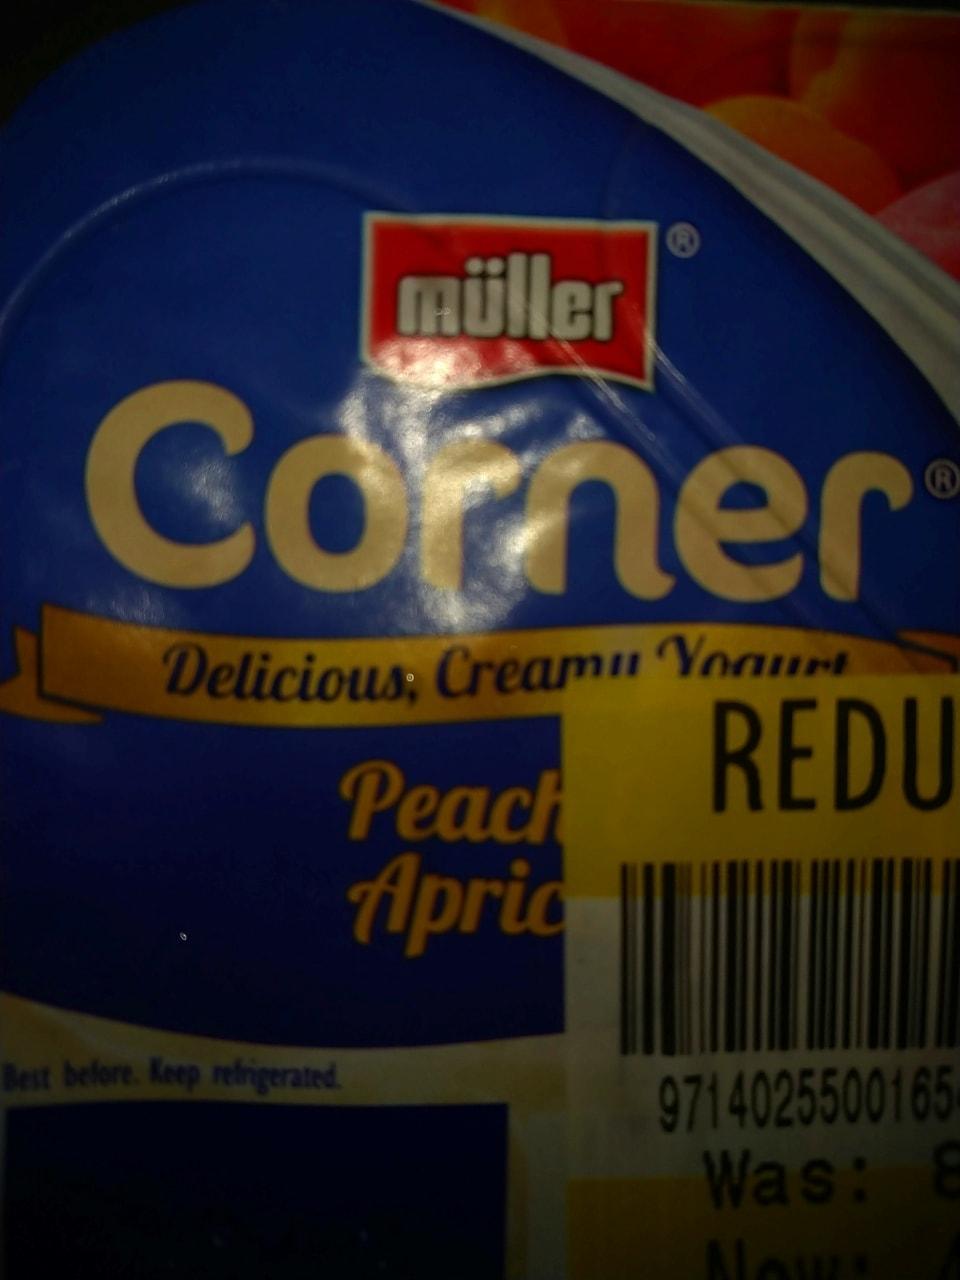 Peach and apricot yoghurt